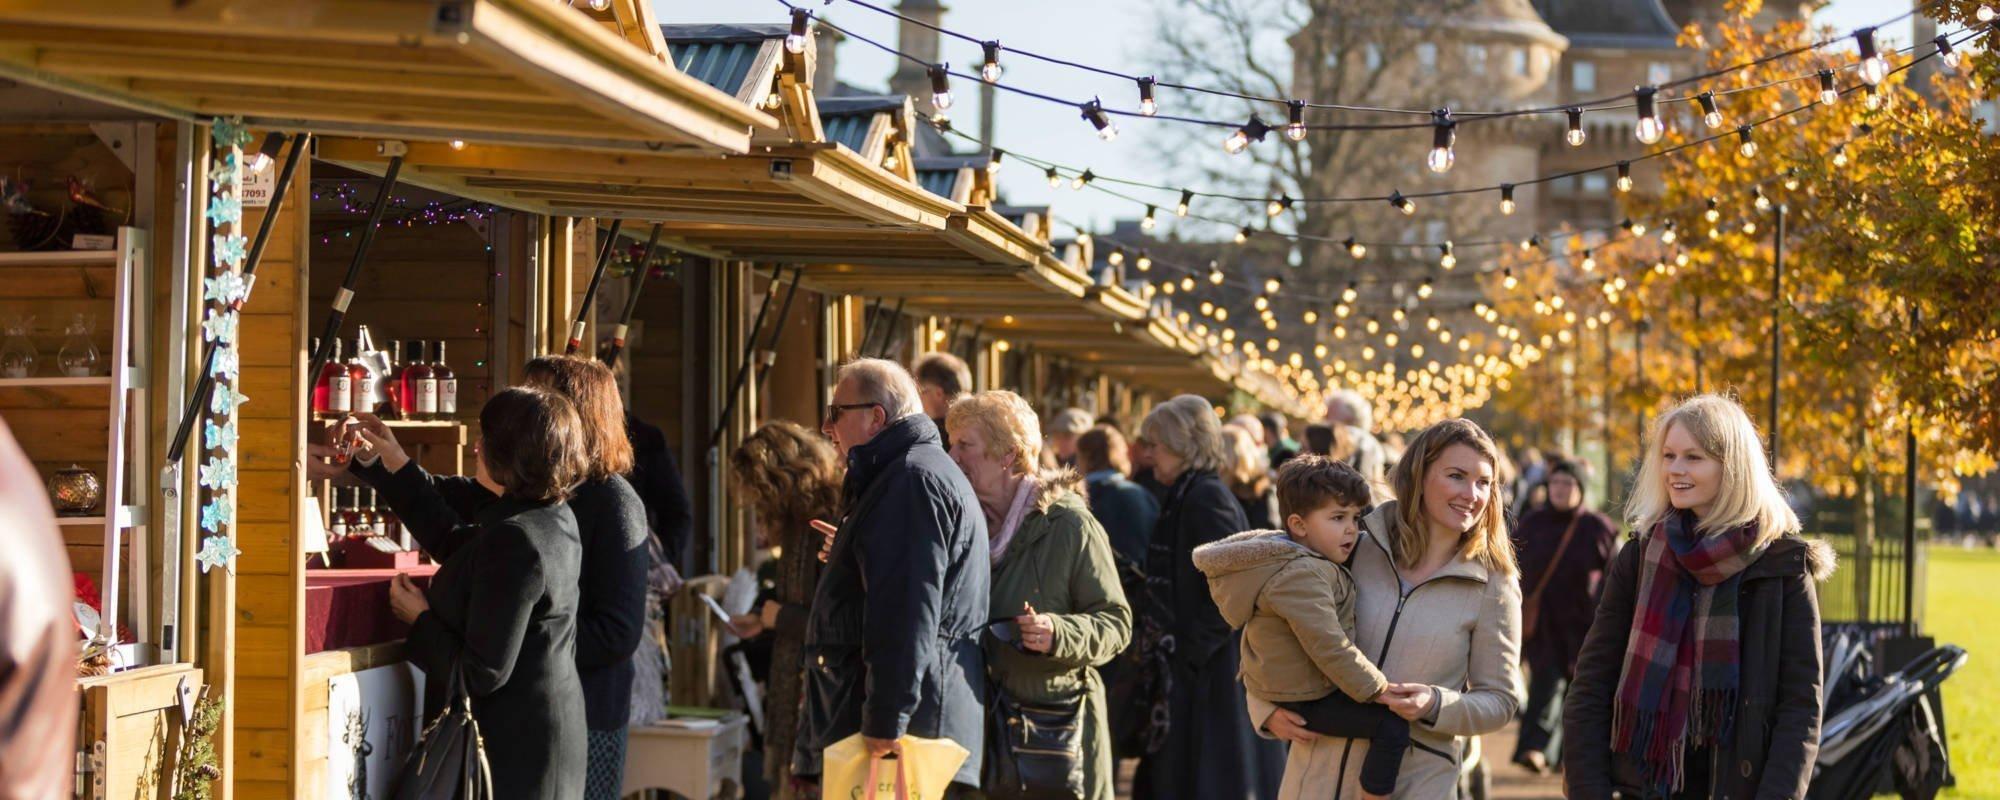 Waddesdon Manor Christmas Fair 2018